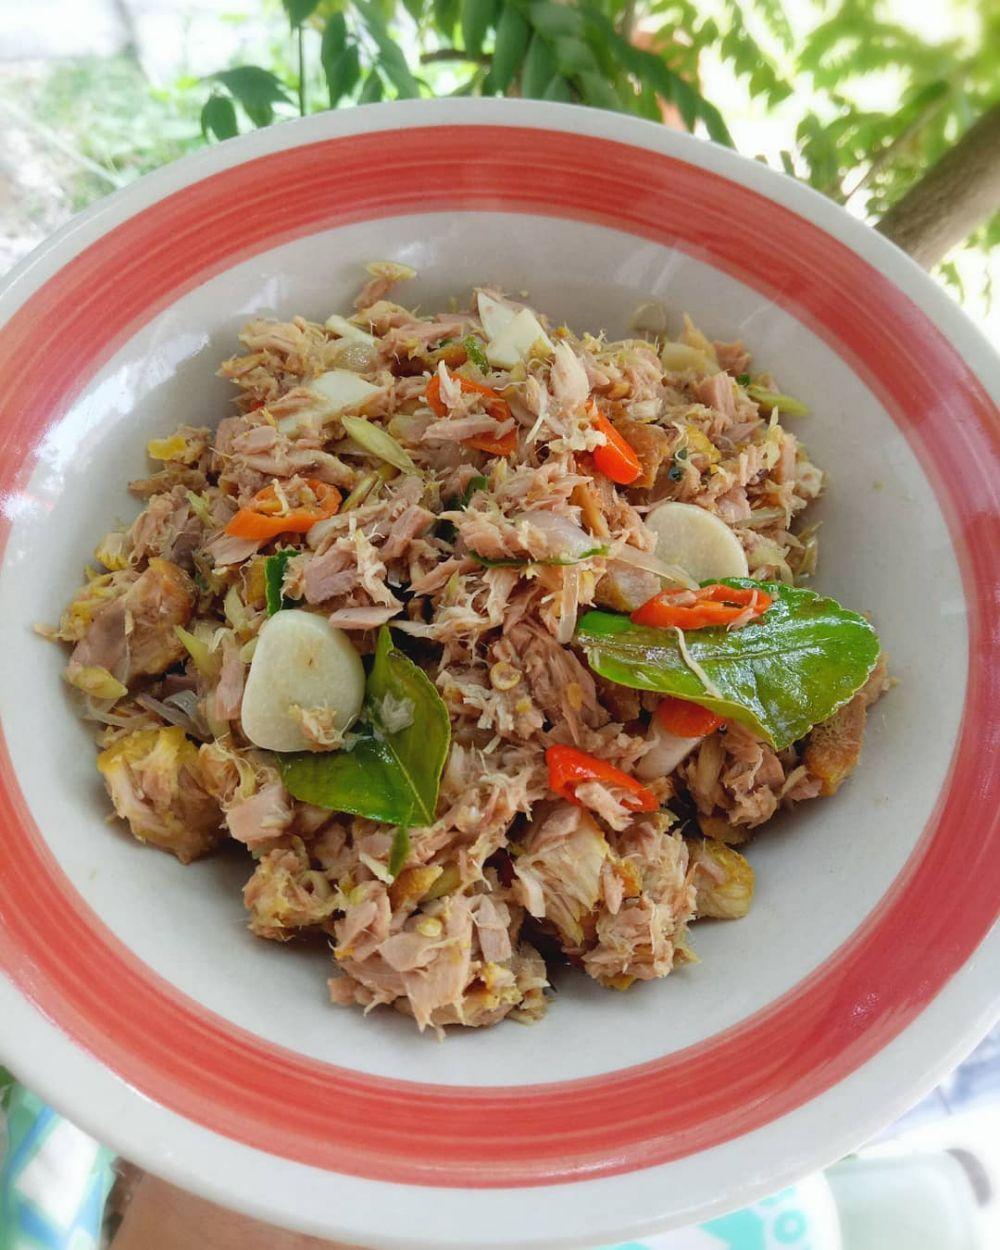 Resep Olahan Ikan Tuna C 2020 Brilio Net Makanan Resep Ikan